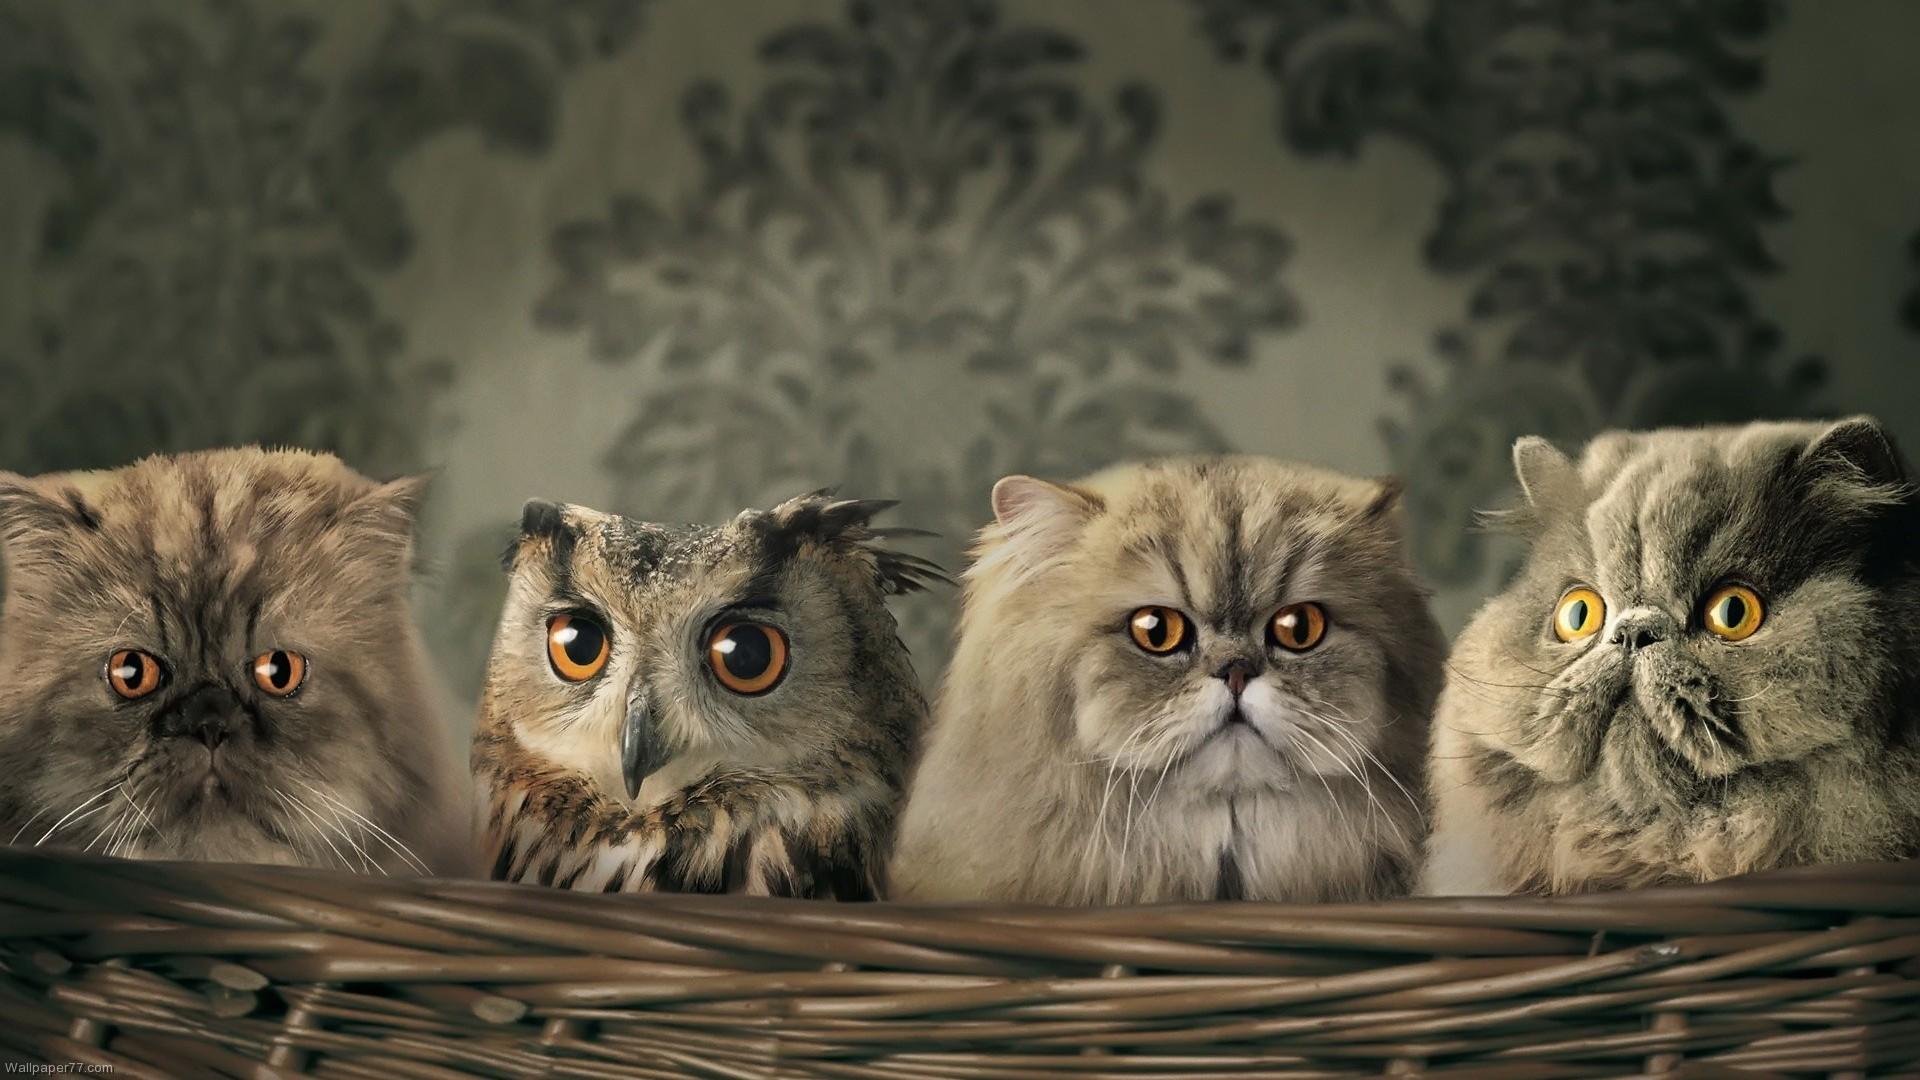 Res: 1920x1080, Cute Baby Owl Wallpaper – Resolution: , Tosha Hock